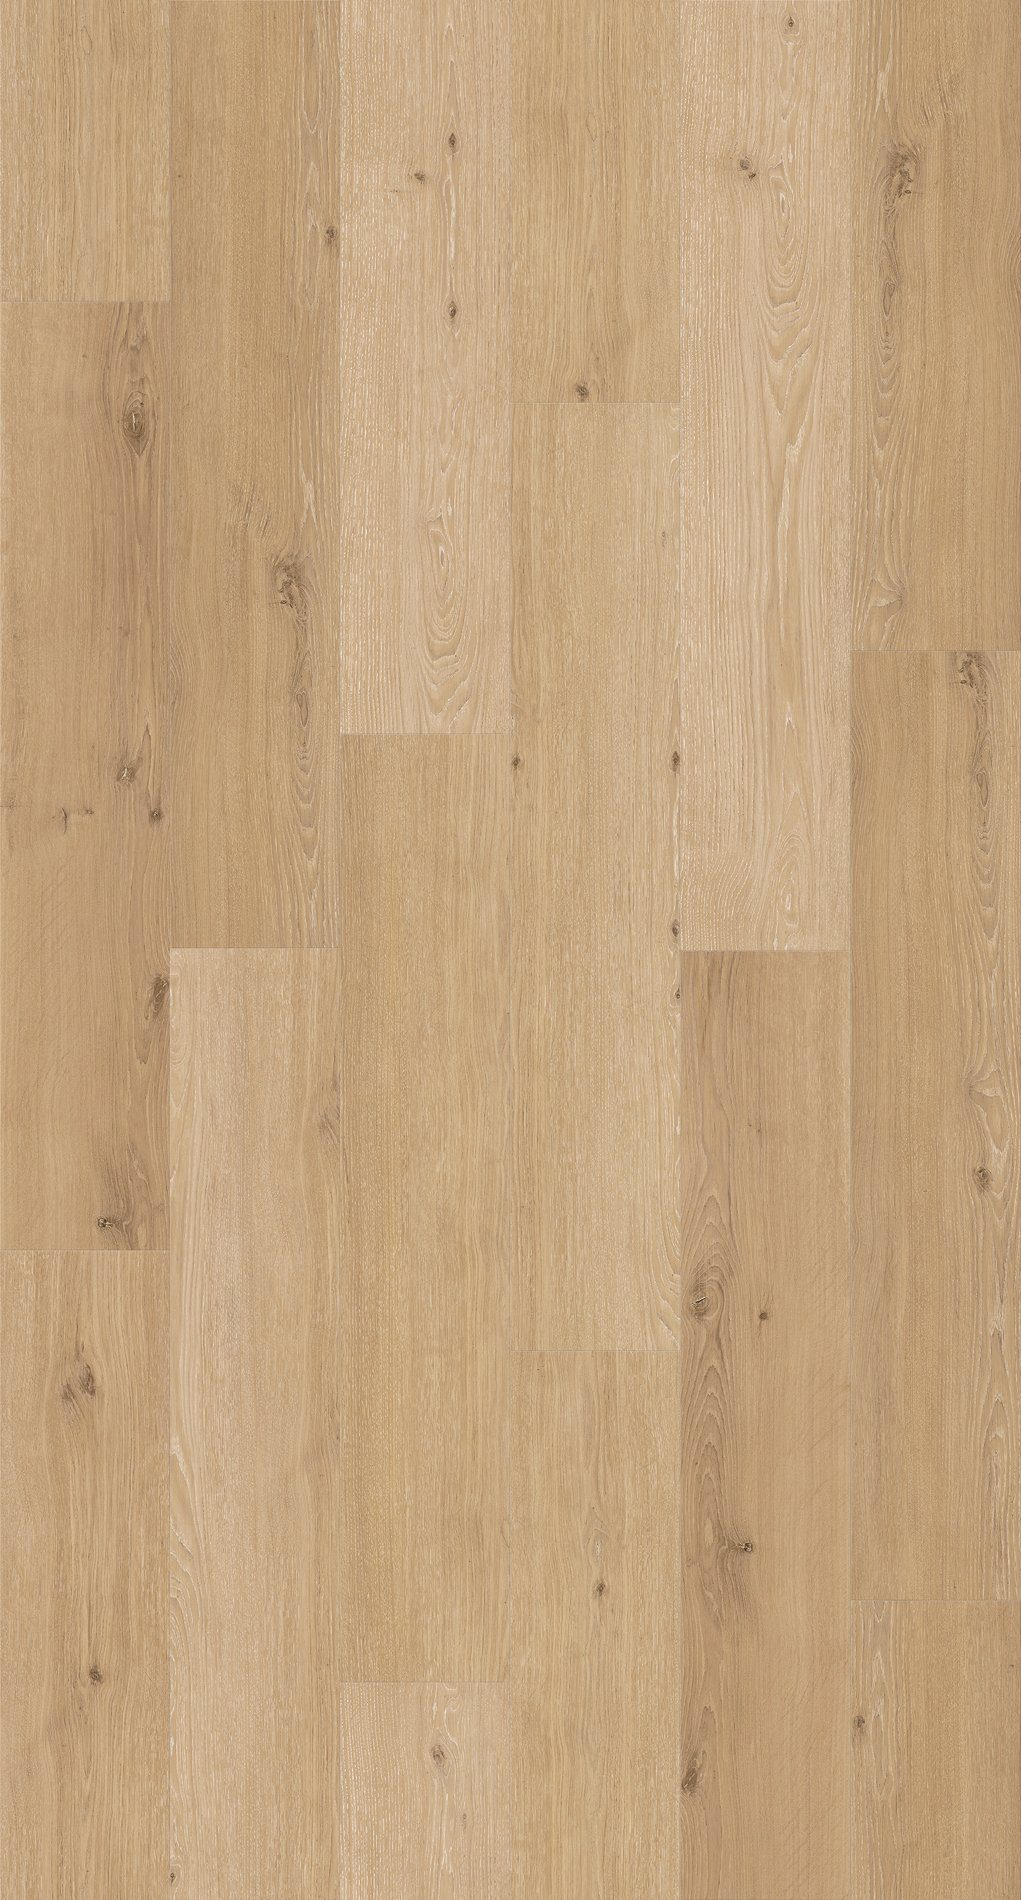 PARADOR Packung: Vinylboden »Classic 2050 - Eiche natural mix hell«, 1213 x 219 x 5 mm, 2,1 m²